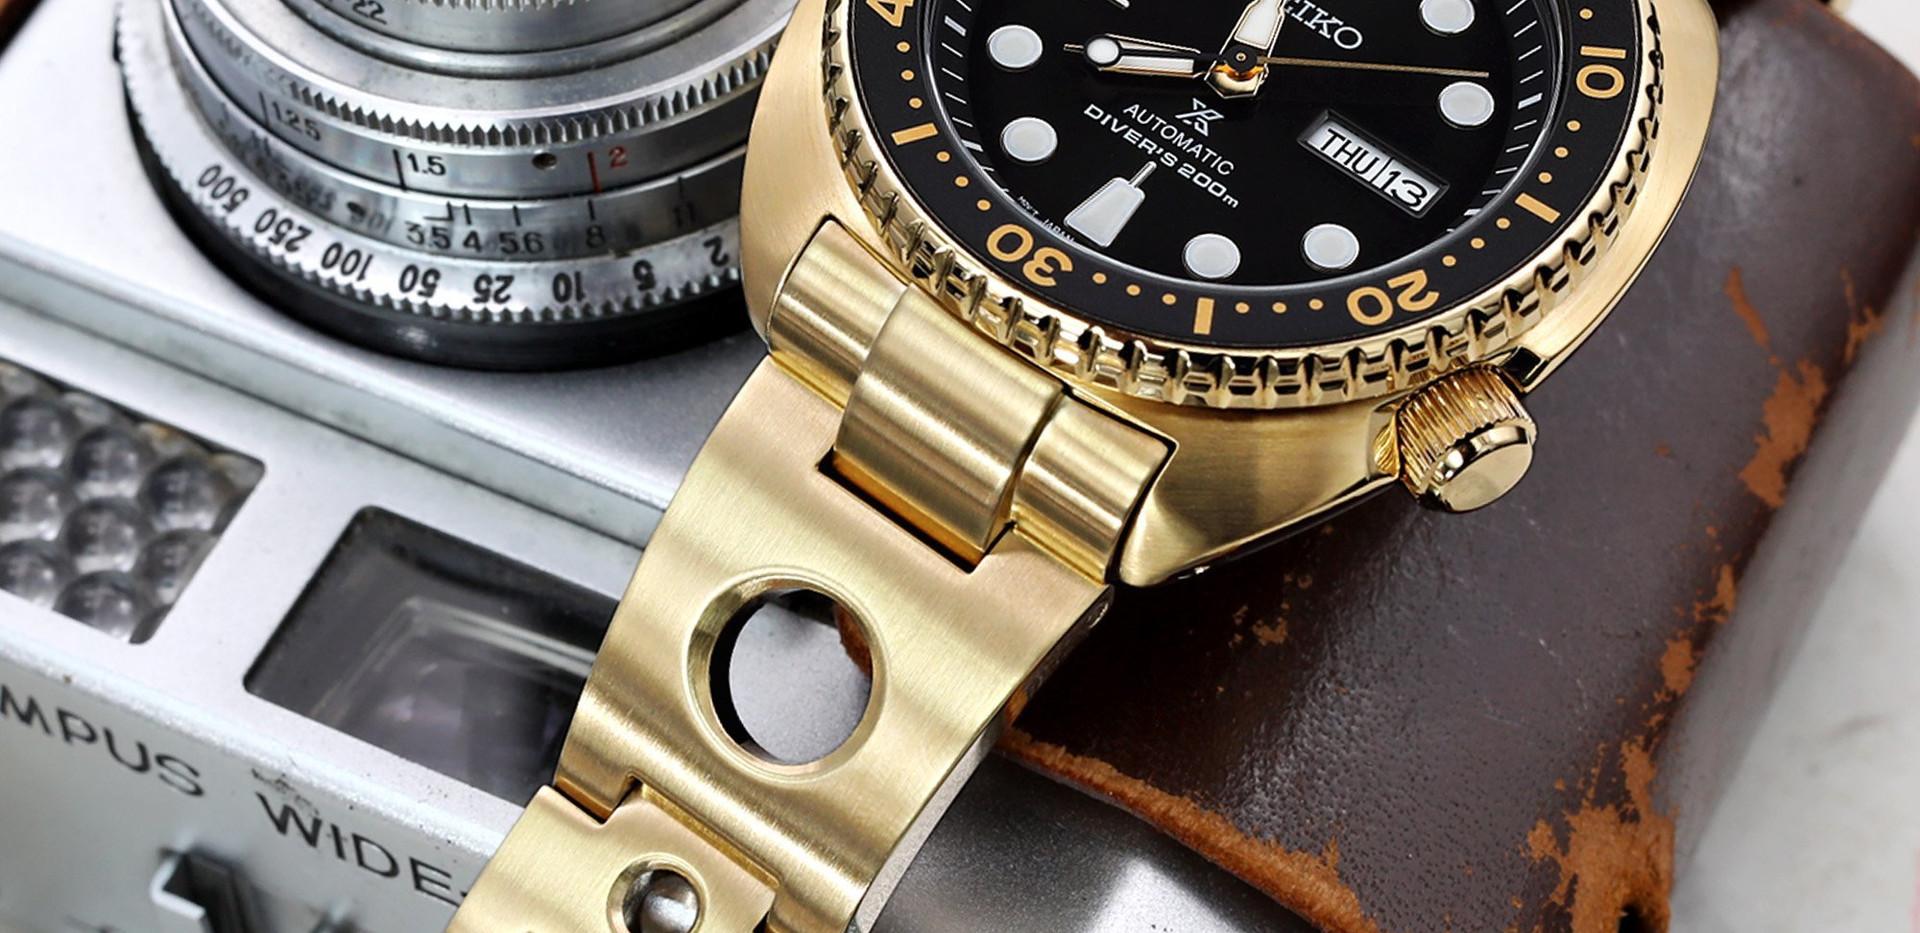 W_SS221820BFG089_Seiko-SRPC44-Gold-Turtl